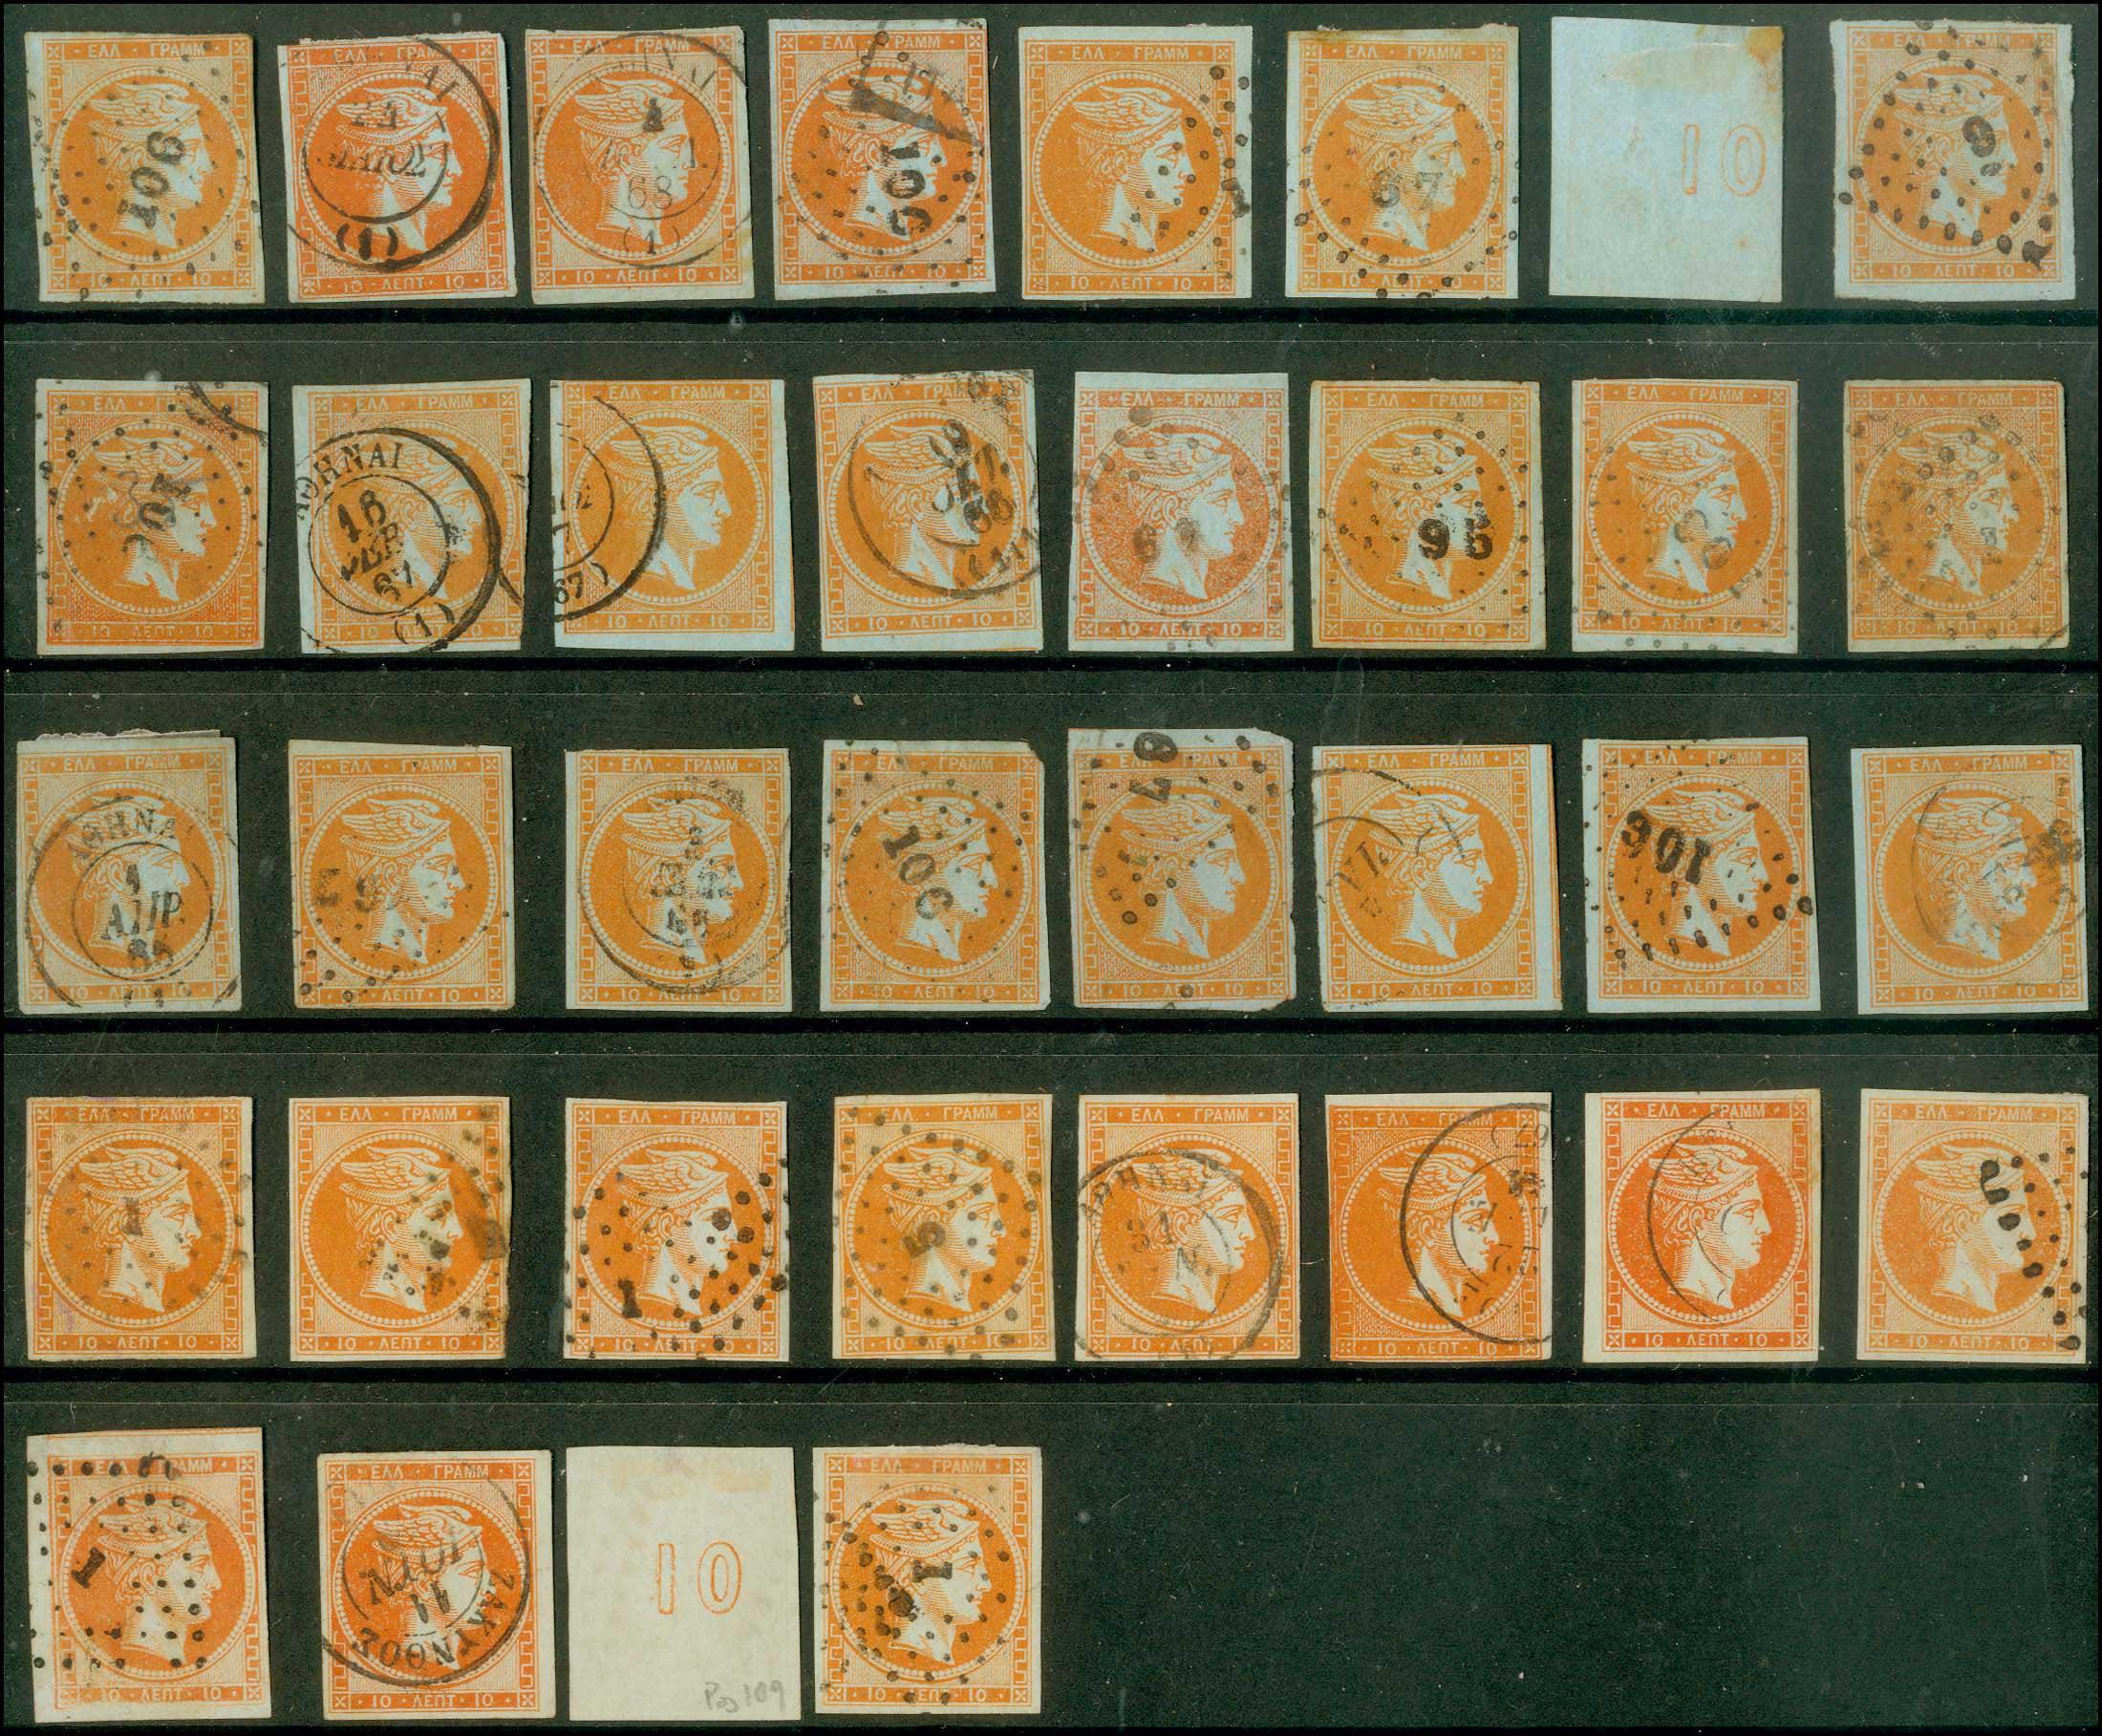 Lot 3 - GREECE-  LARGE HERMES HEAD large hermes head -  A. Karamitsos Public Auction 630 General Stamp Sale